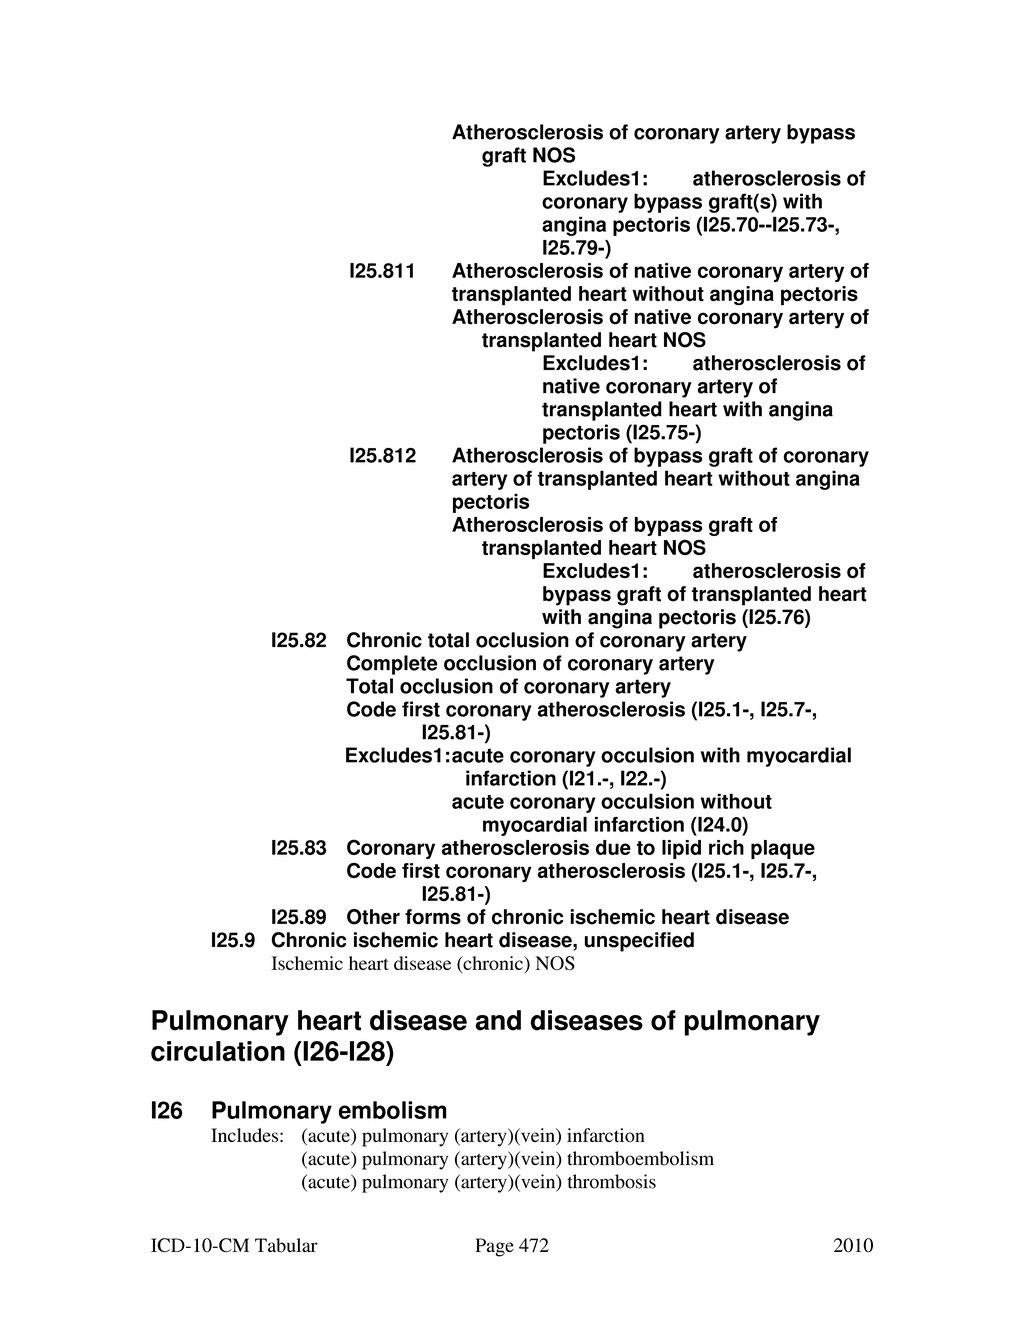 icd 10 code for coronary artery disease with angina pectoris